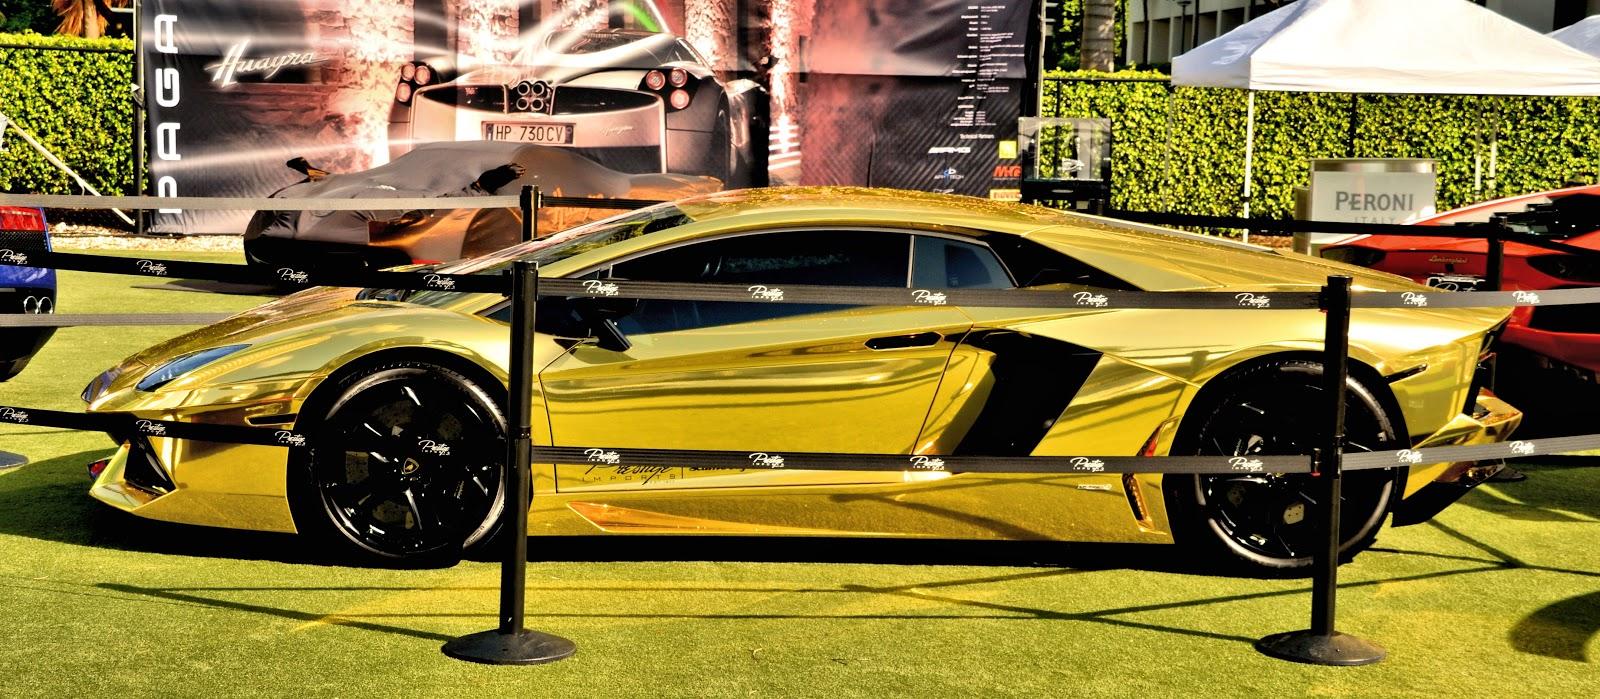 100 Gold Bugatti Cars File Bugatti Veyron Super